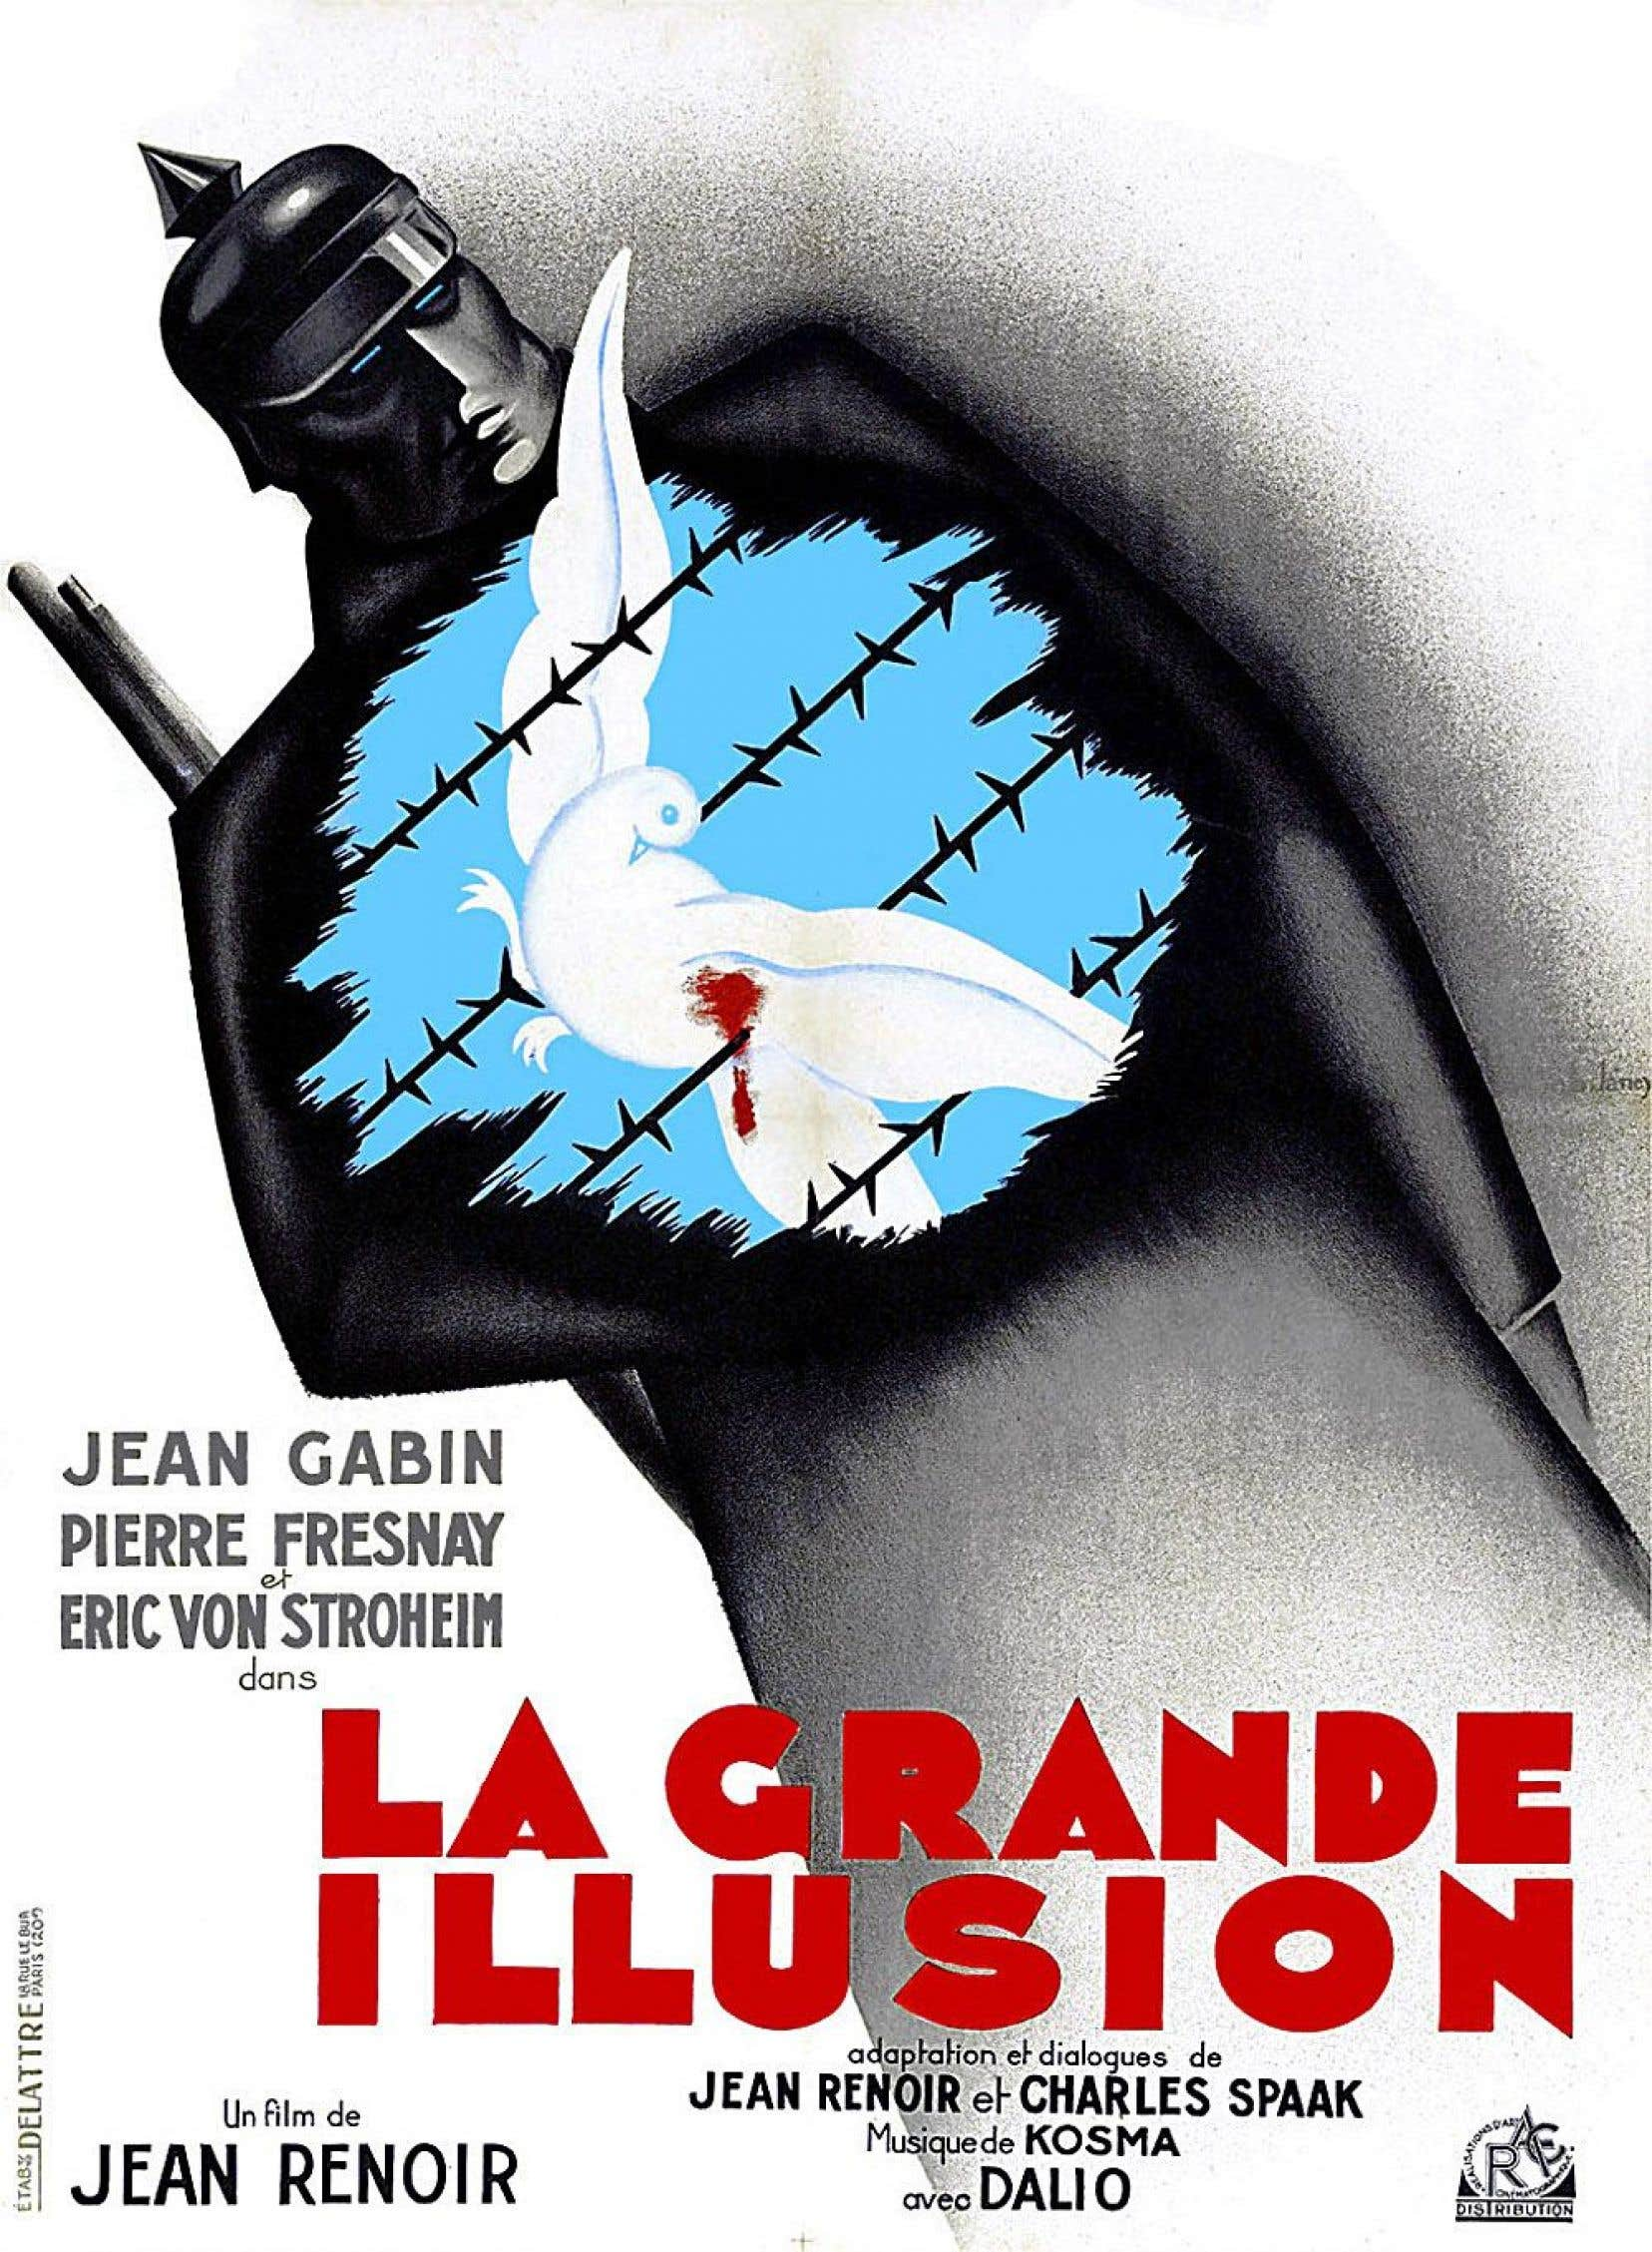 Affiche originale du film «La grande illusion», de Jean Renoir